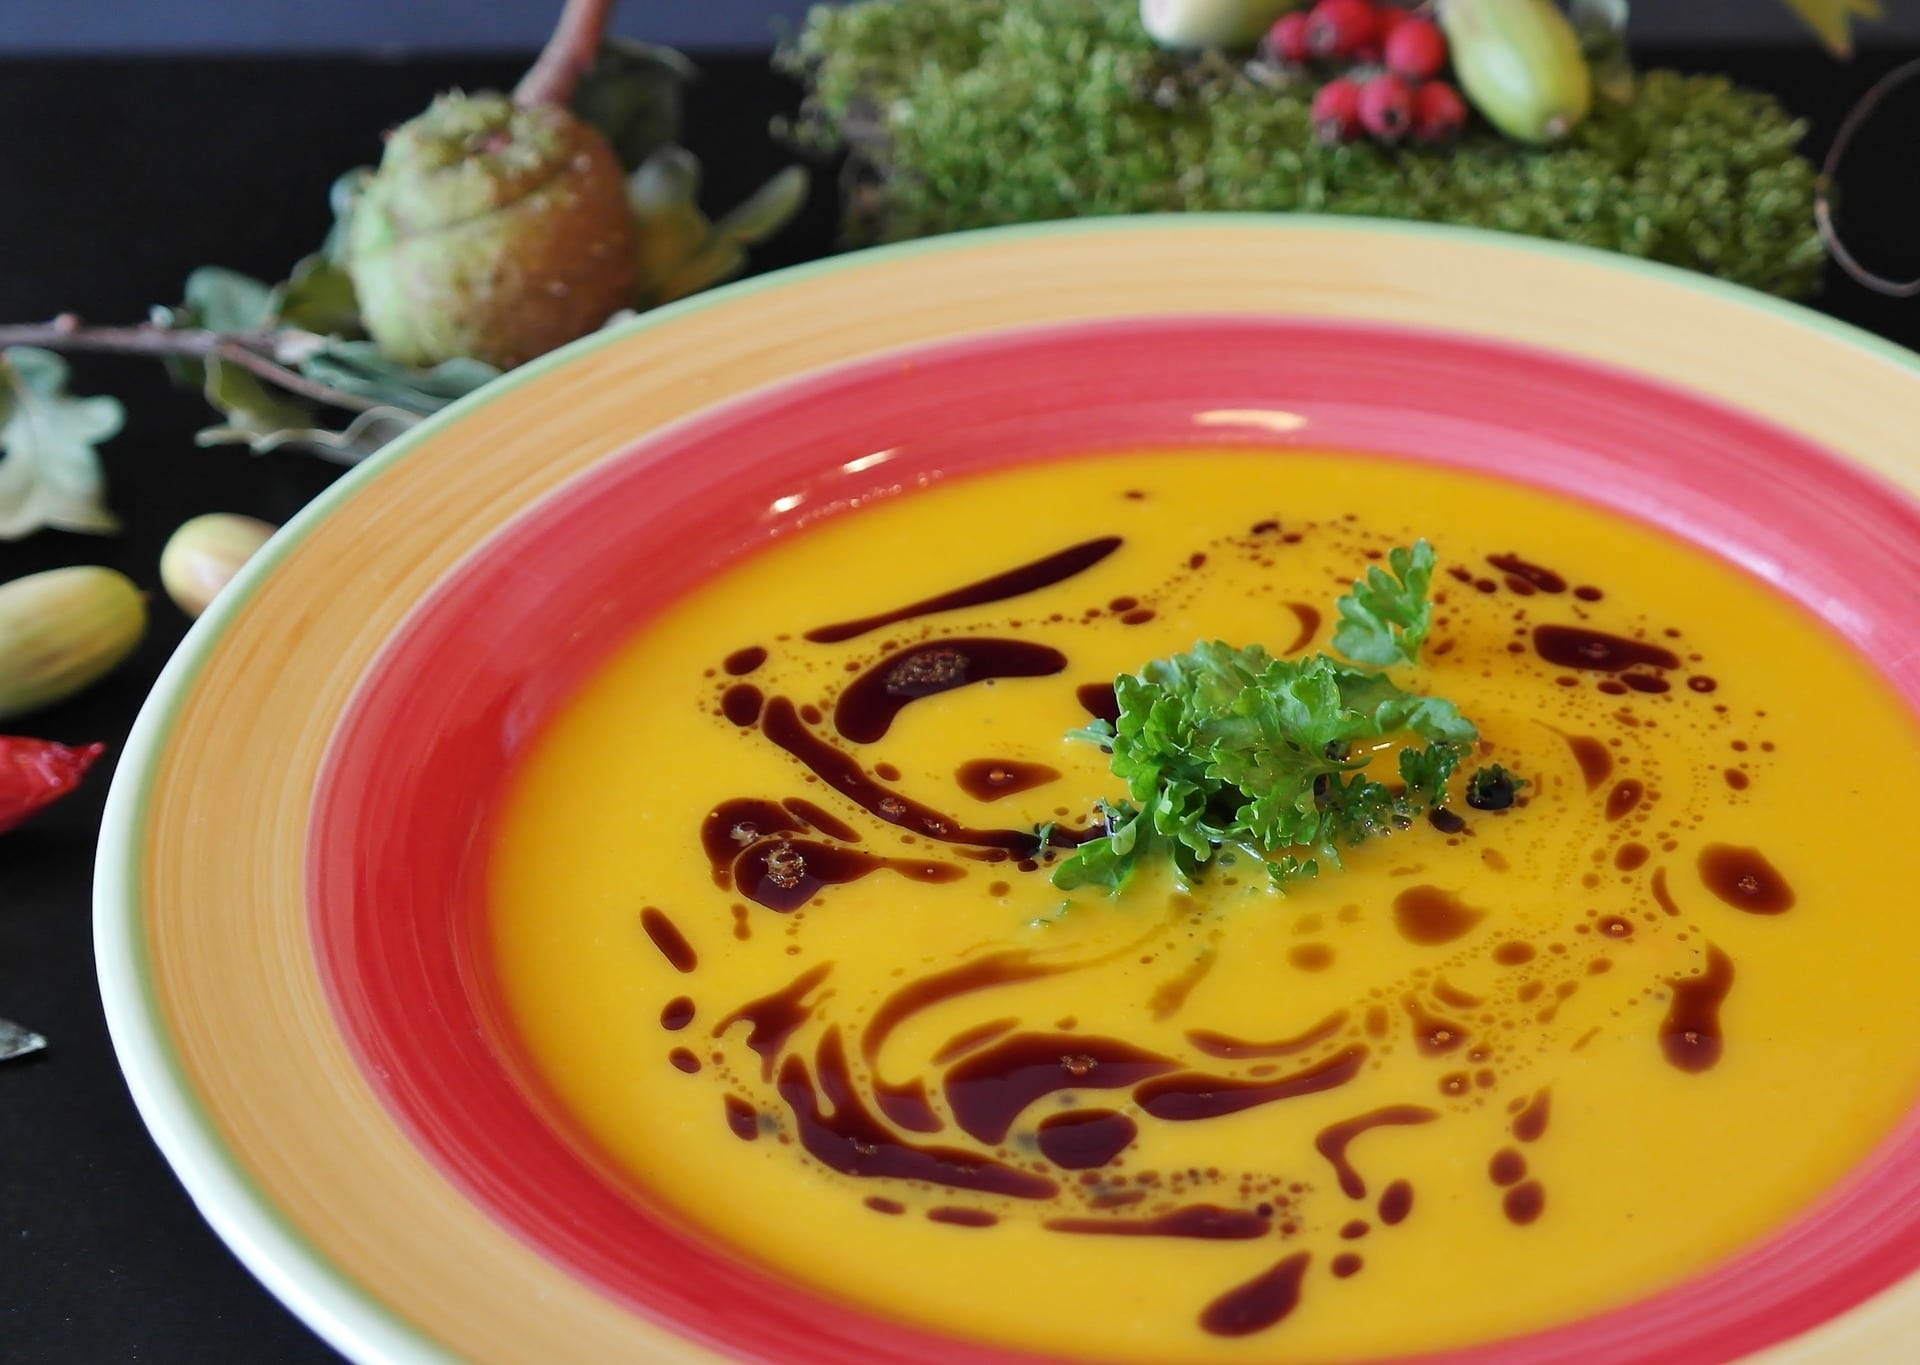 Dýňový olej nádherně vynikne v krémové polévce / foto: pixabay.com